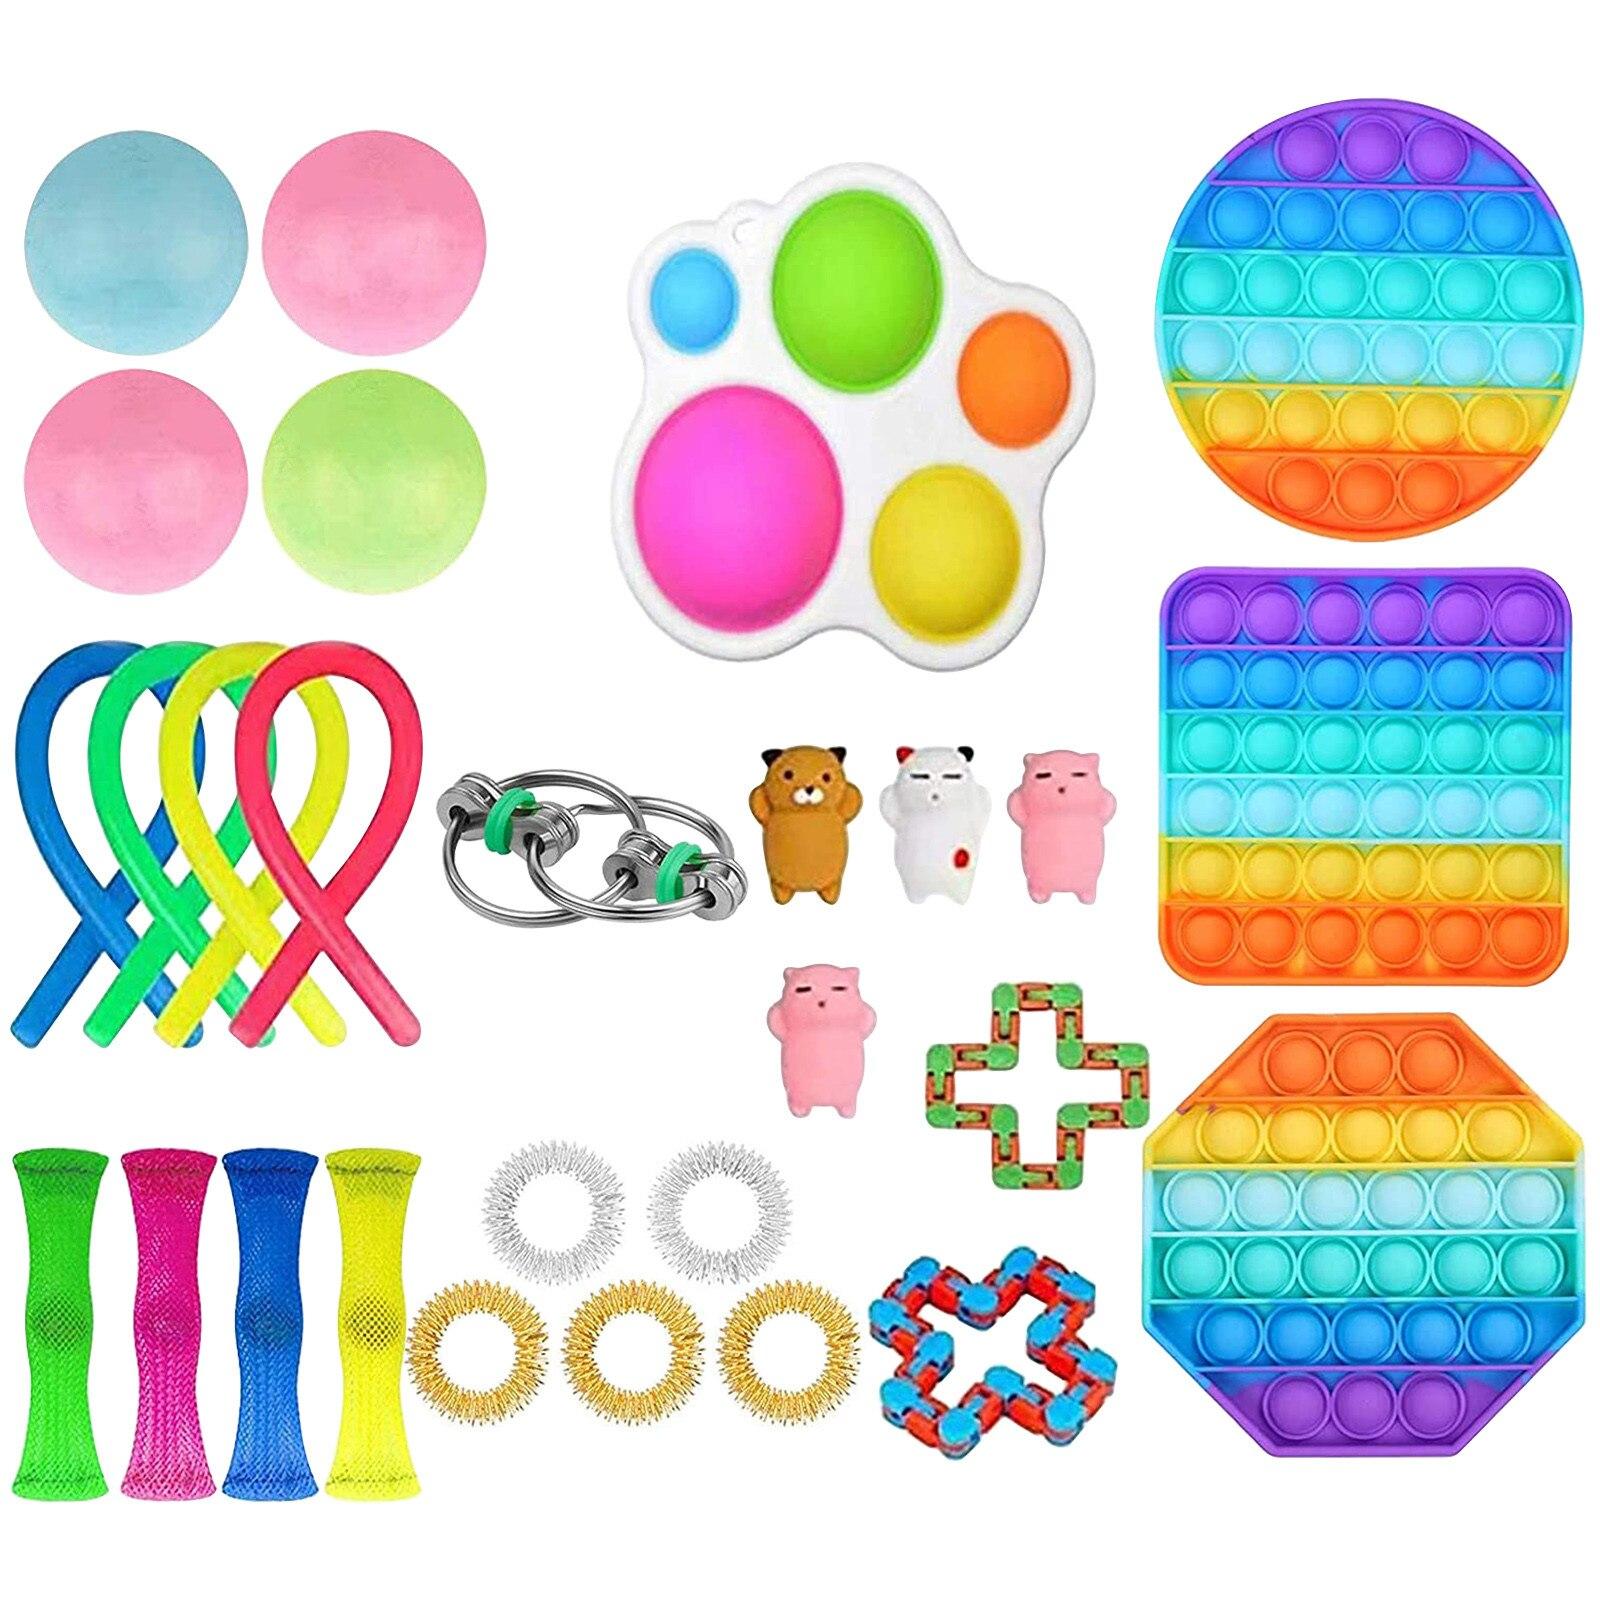 Toys-Pack Figet-Toy Anti-Stress-Set Fidget Sensory Popit Squishy Dropship Simple Dimple